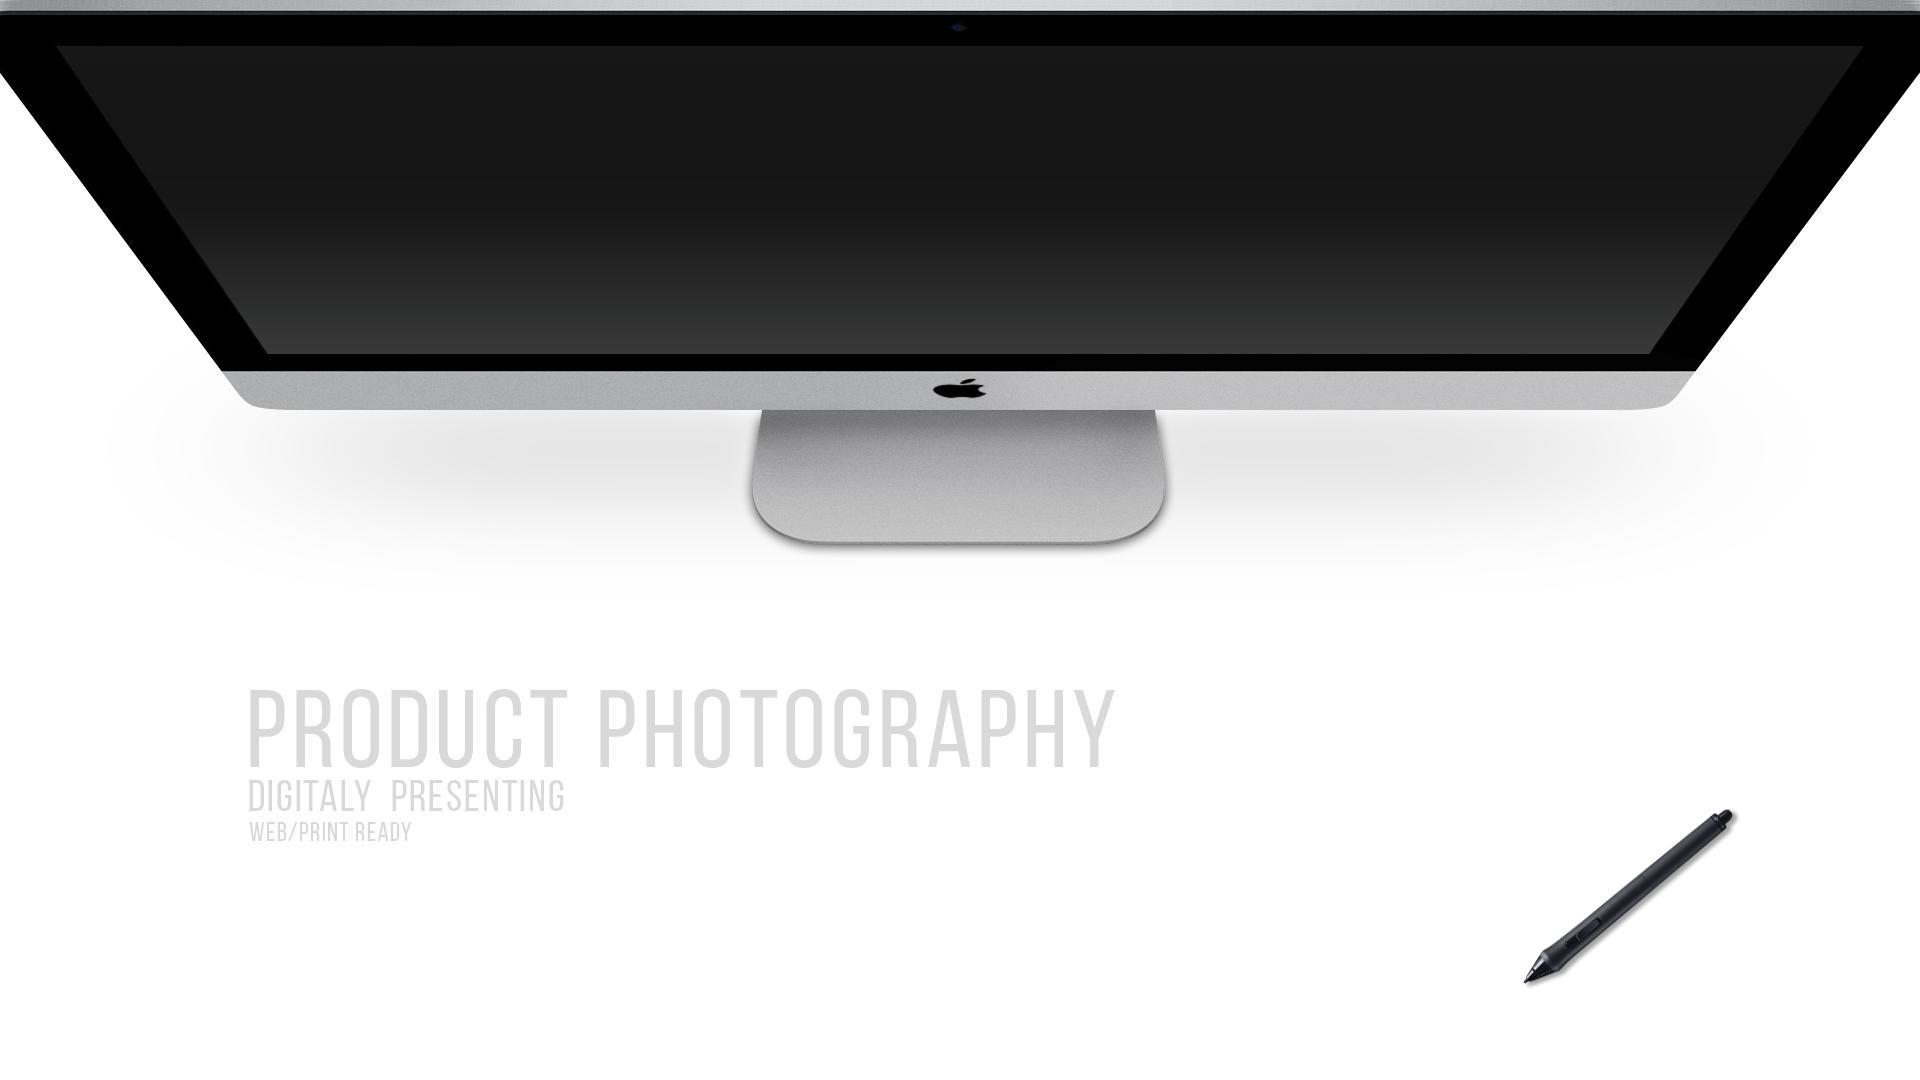 product photography kompjuter.jpg